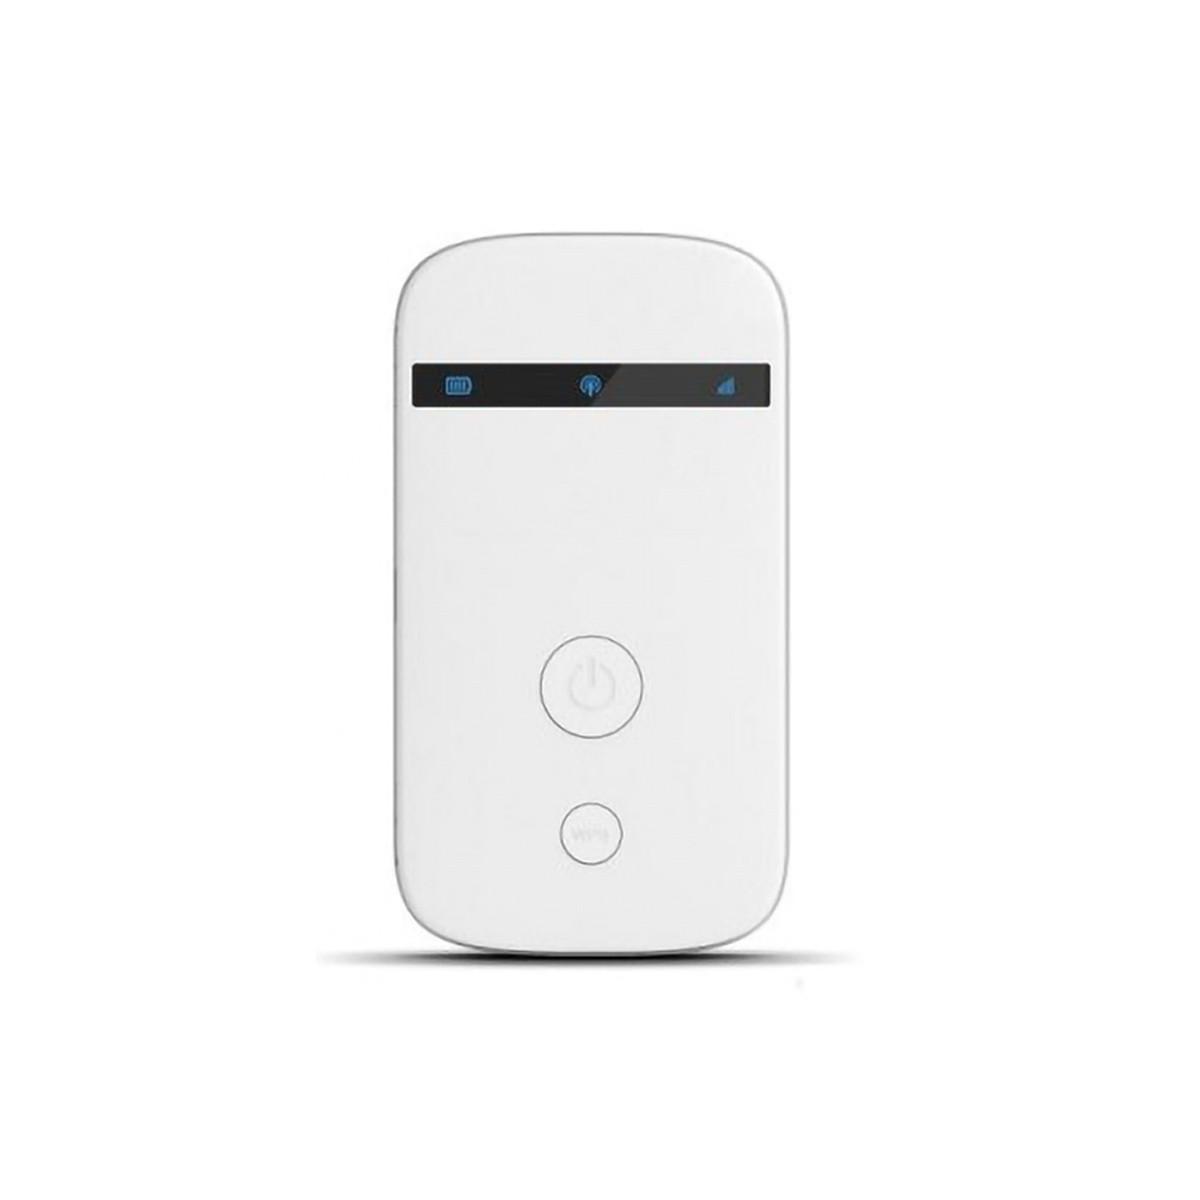 4G LTE Wi-Fi роутер ZTE MF90-C1 (Киевстар, Vodafone, Lifecell) с антенным выходом